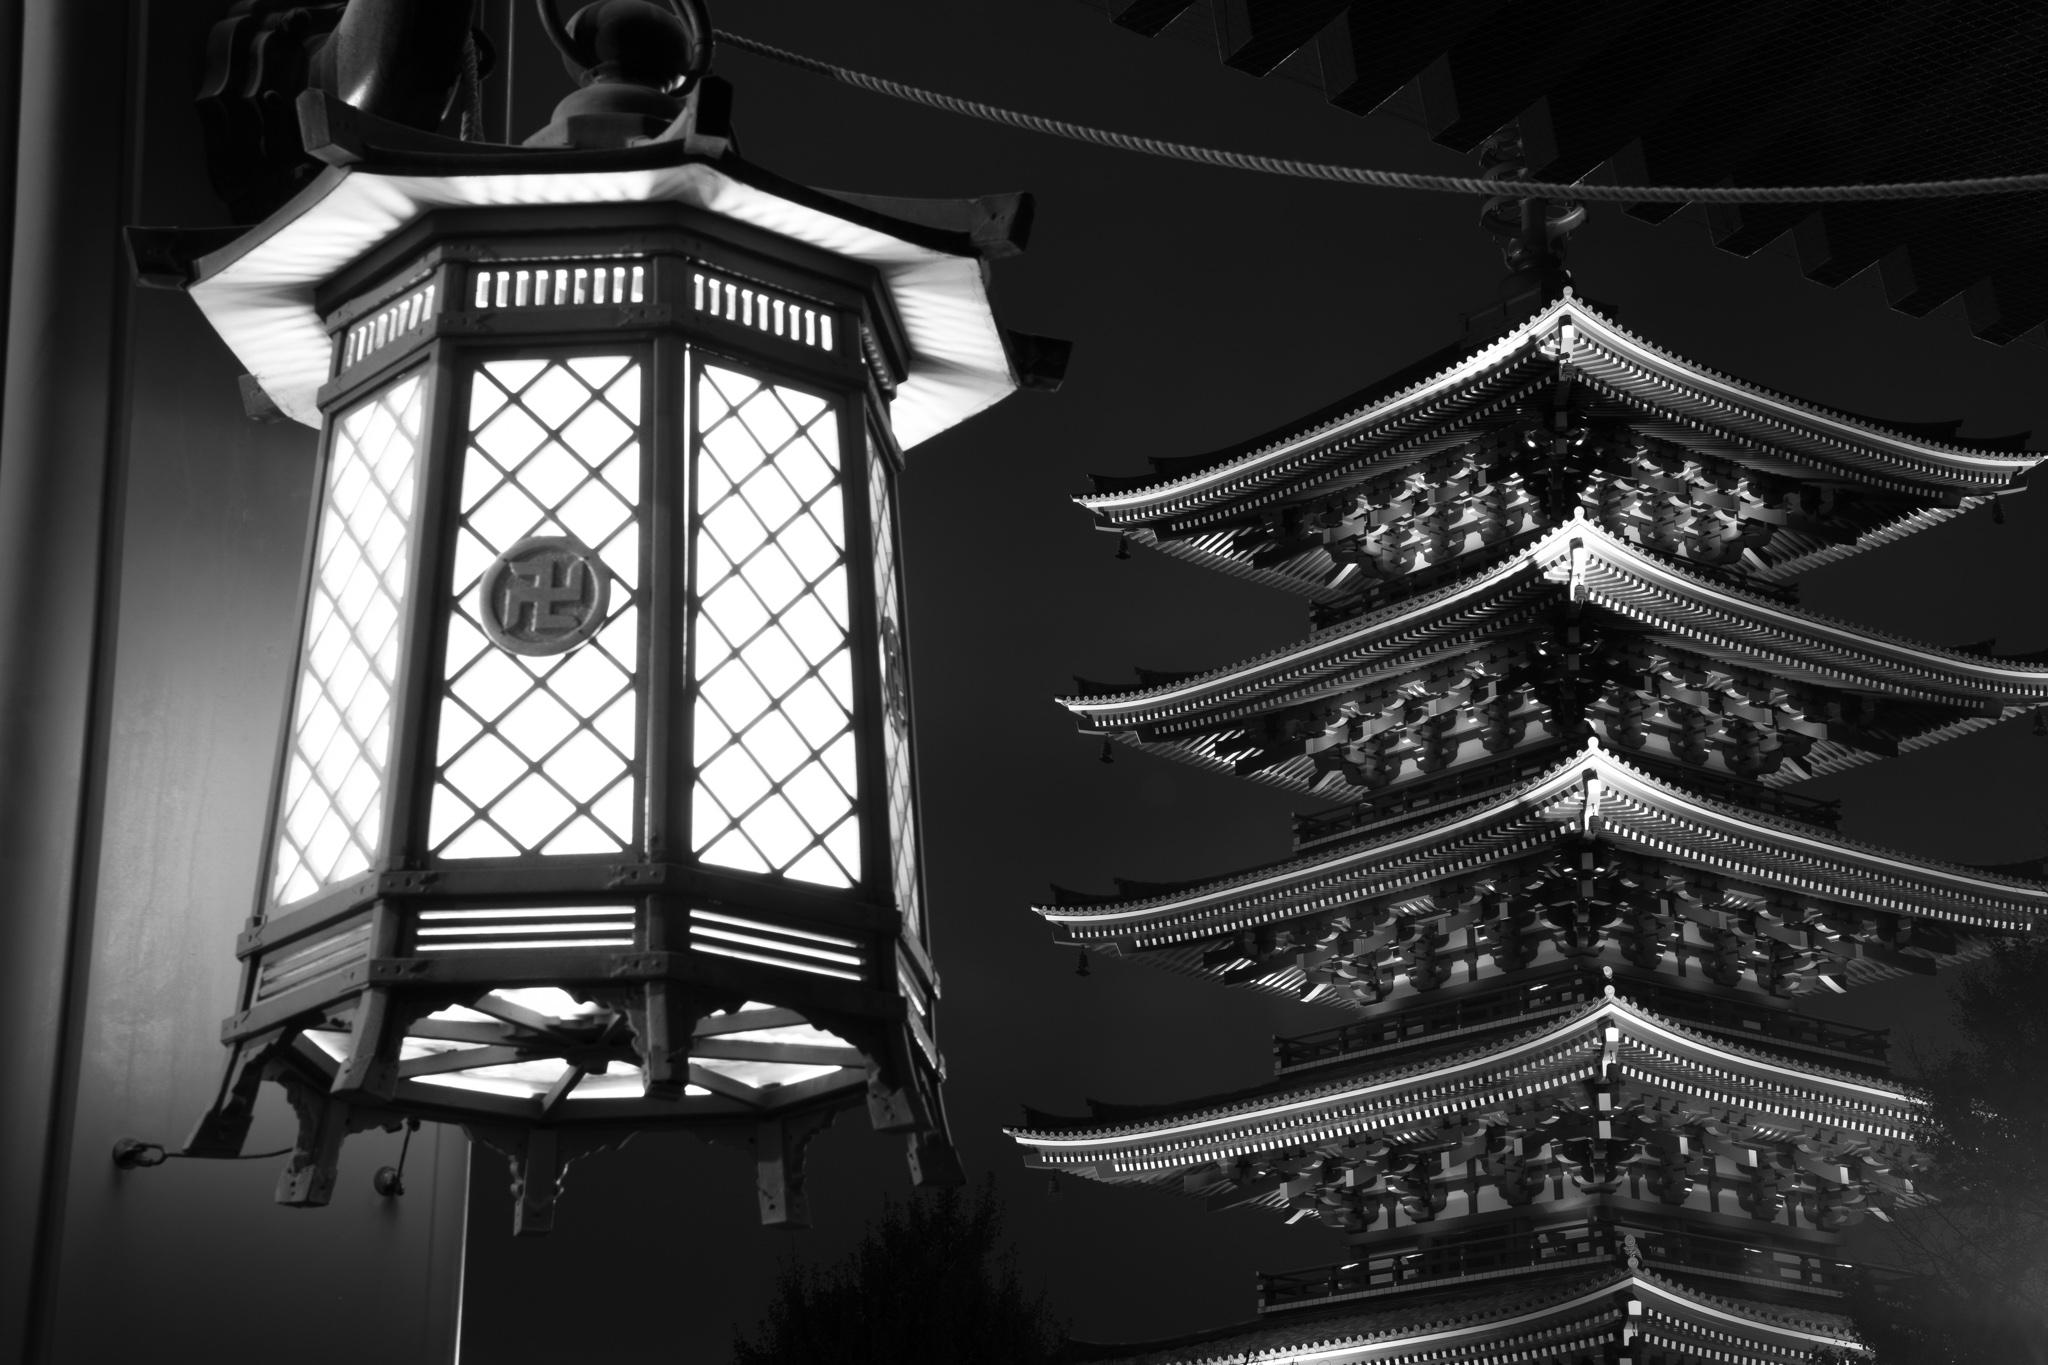 5872-japan-urban-autumn-lights.jpg